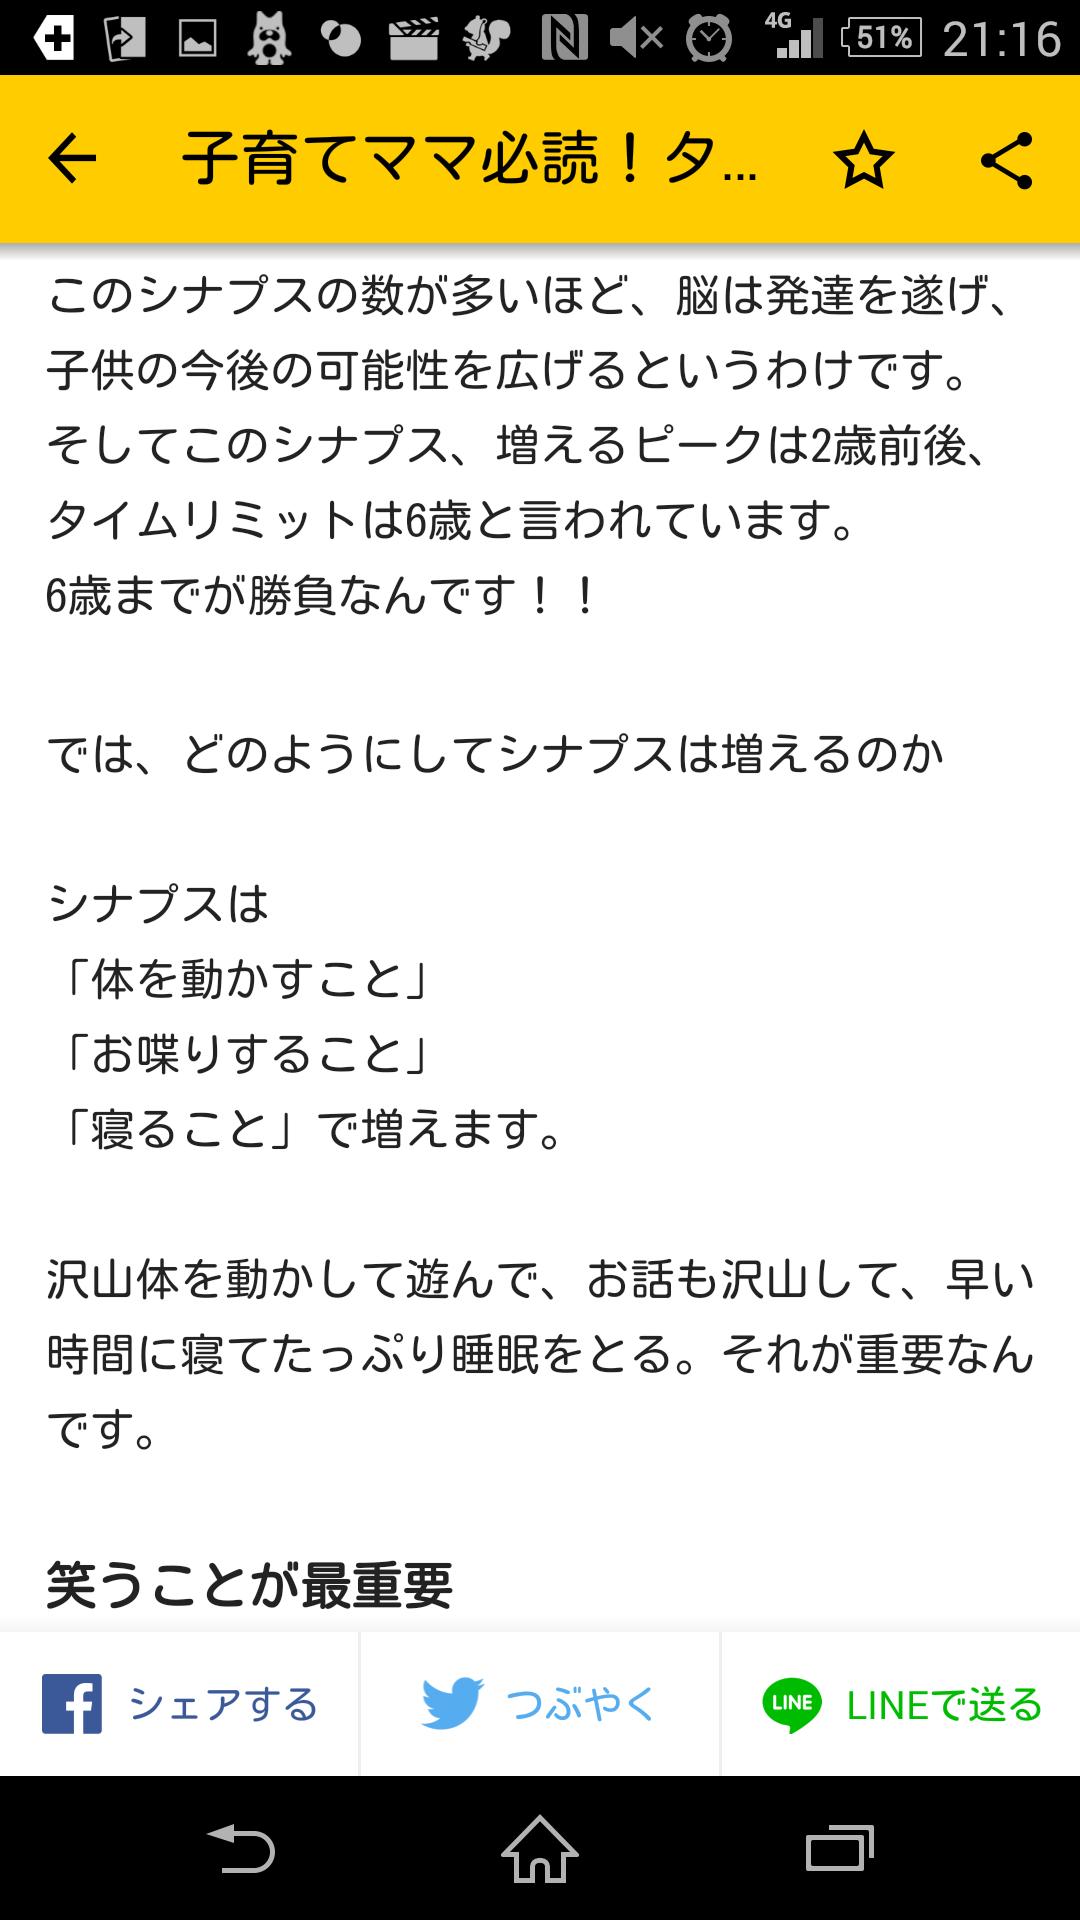 Screenshot_2015-11-09-21-16-59